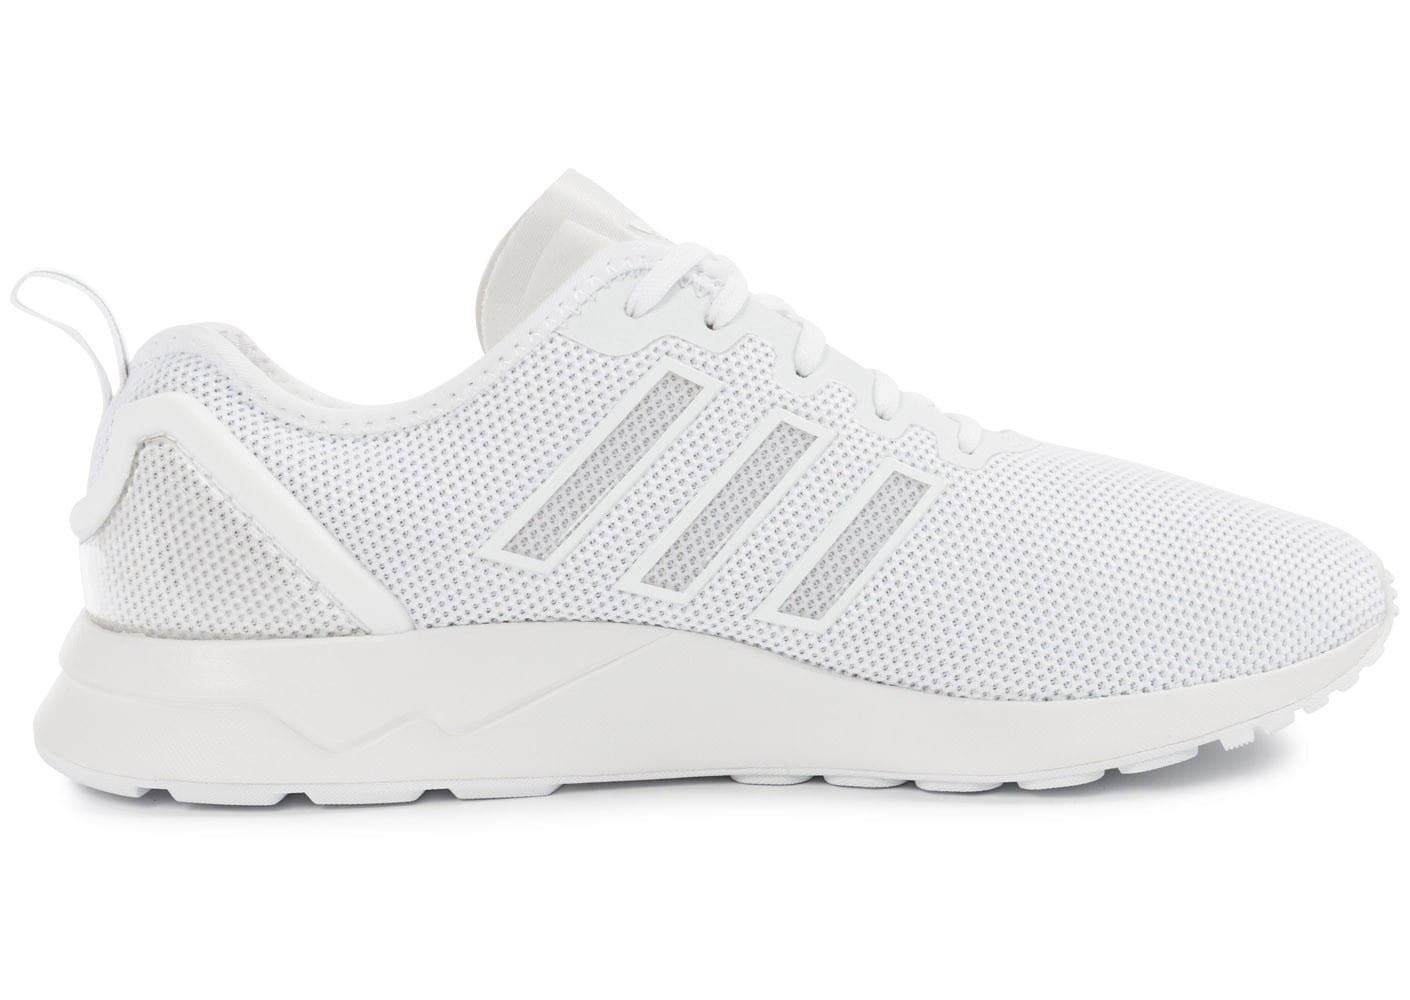 adidas zx flux blanche homme